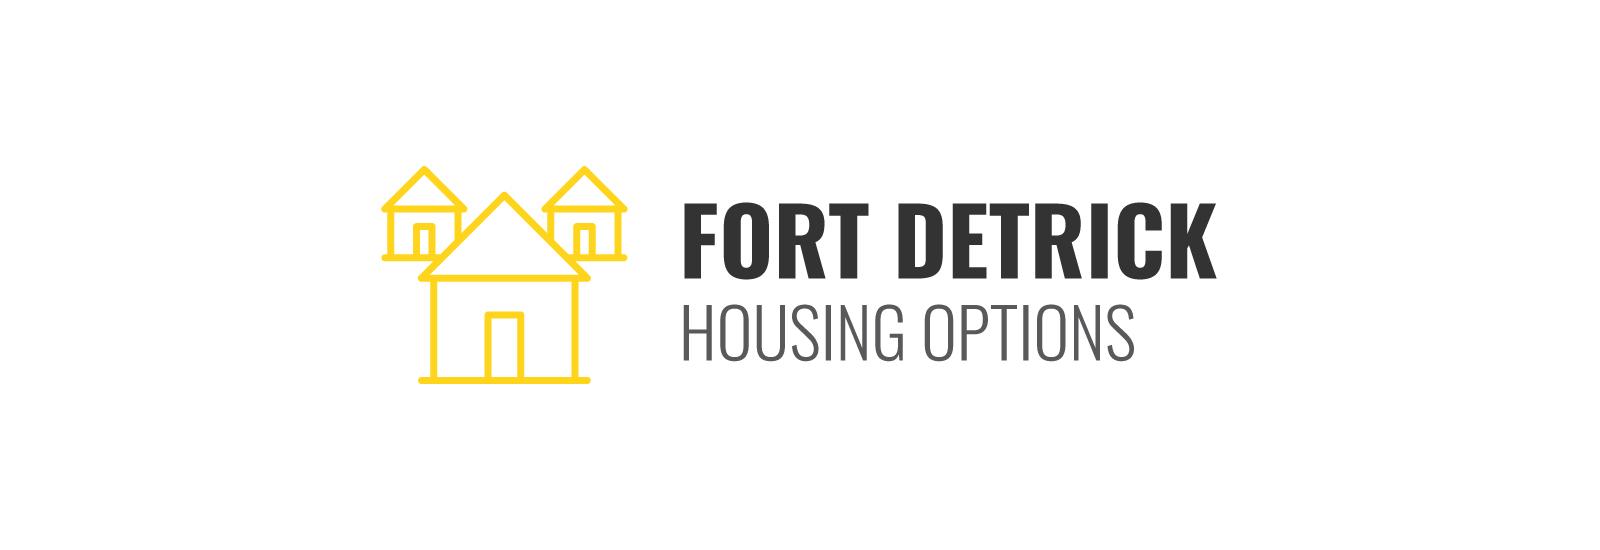 Fort Detrick Housing Options